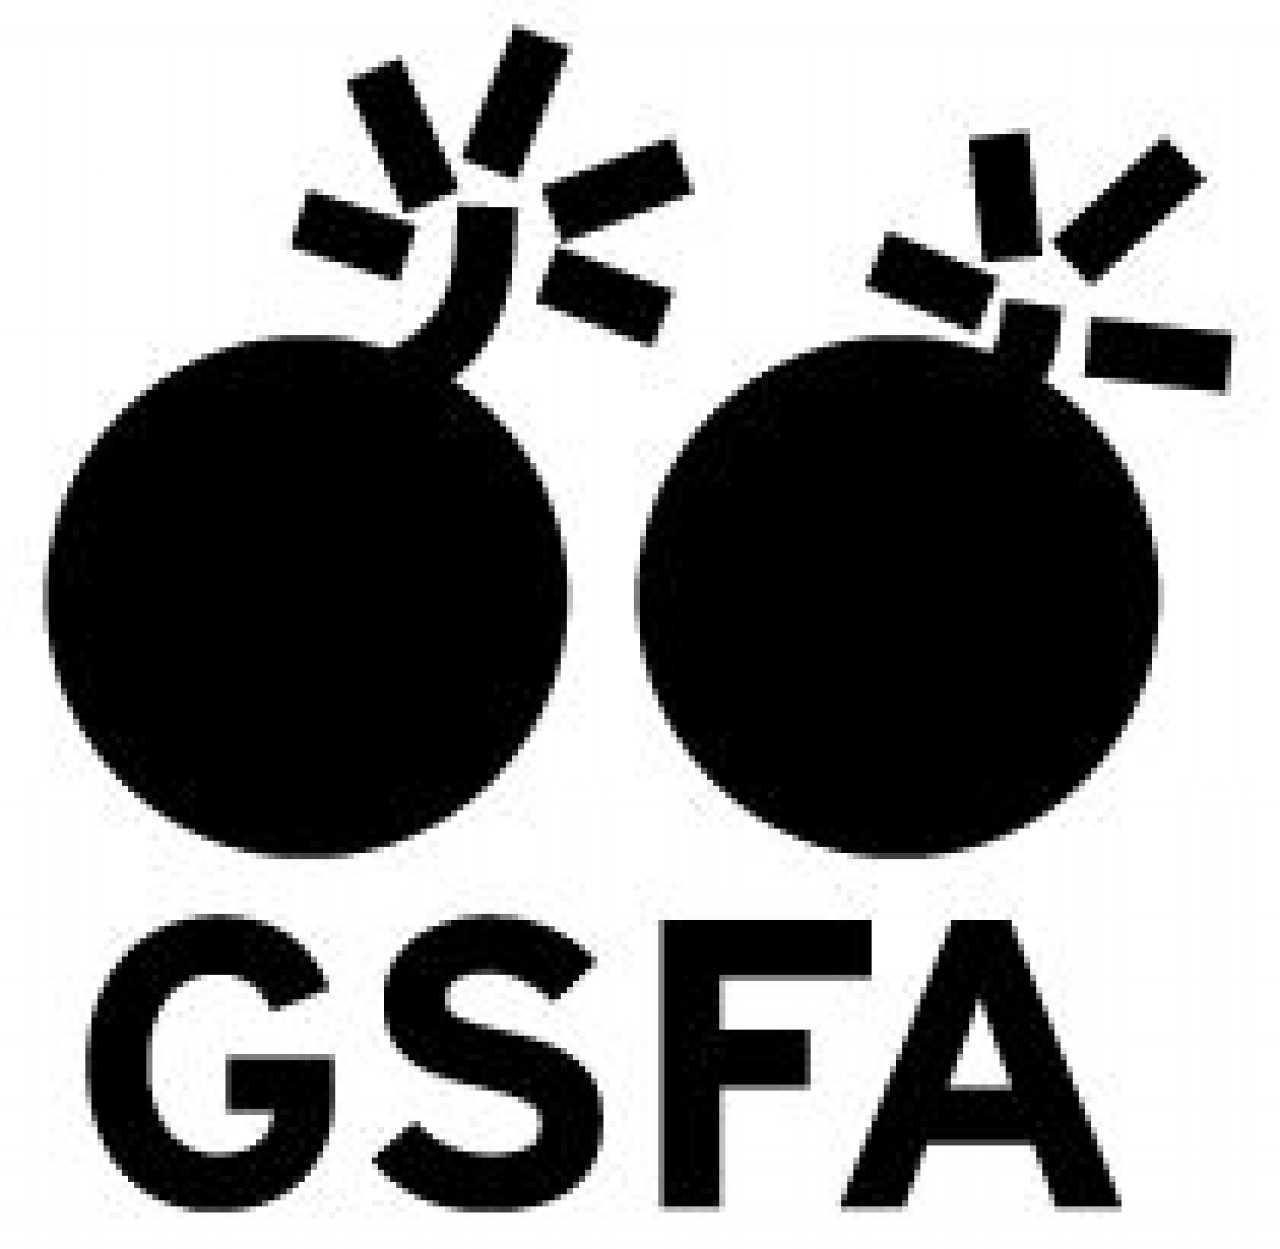 GSFA / STFG